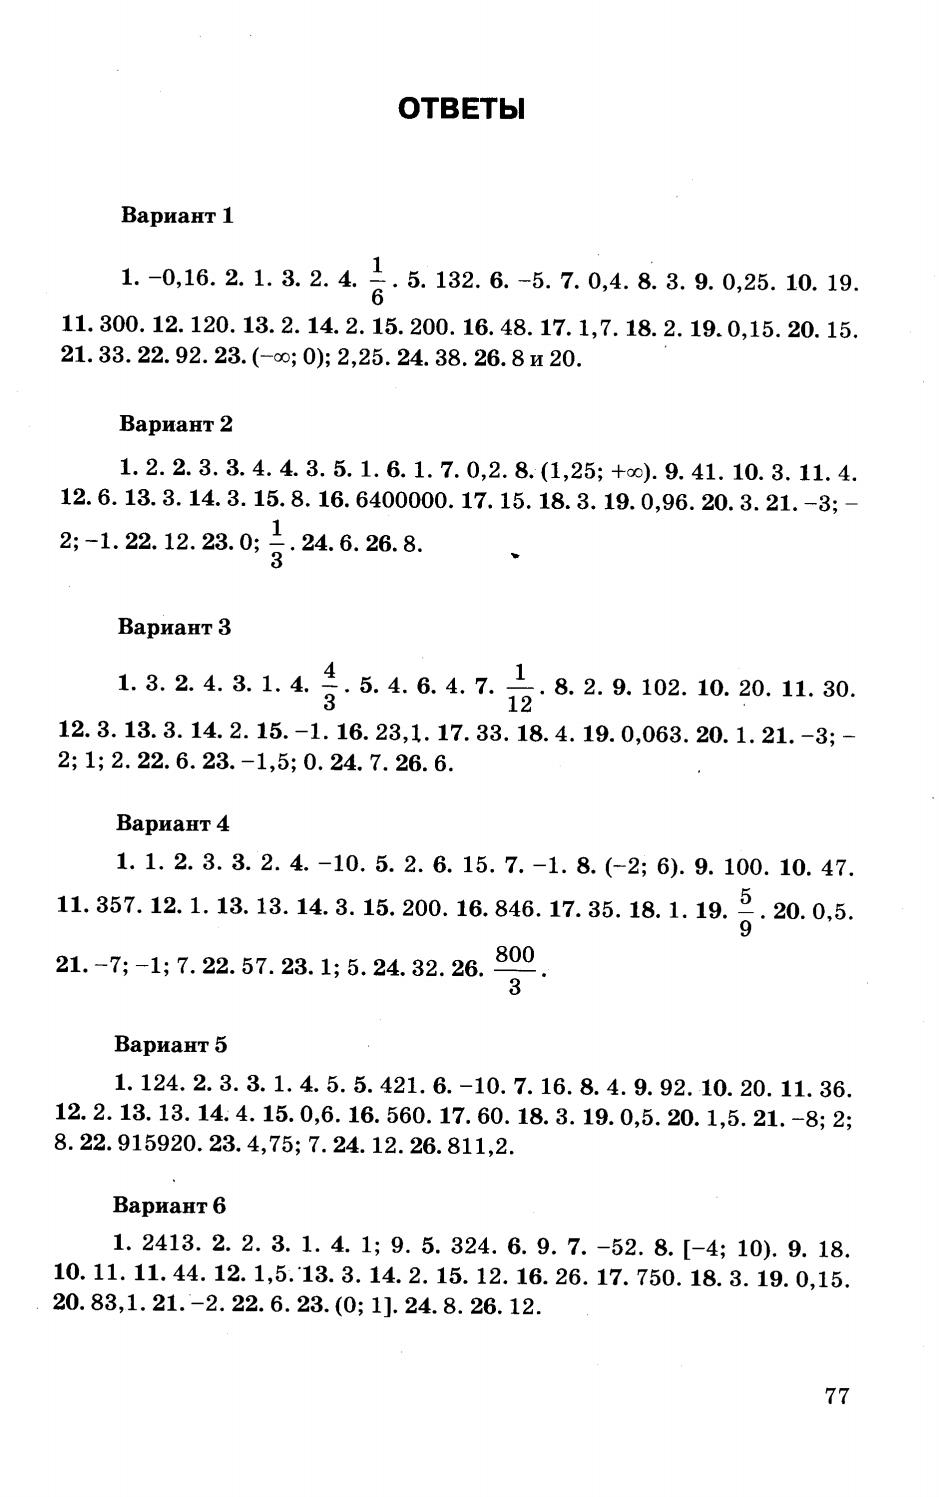 https://docs.google.com/viewer?pid=explorer&srcid=0Bw_f54pvrxEtbldKNGgyaFE3TDg&chrome=false&docid=e803bf4555b2fe7a8e01072ad16bc93b%7Cc9acad21277b9c8c76d1236b5bcea6e2&a=bi&pagenumber=78&w=939